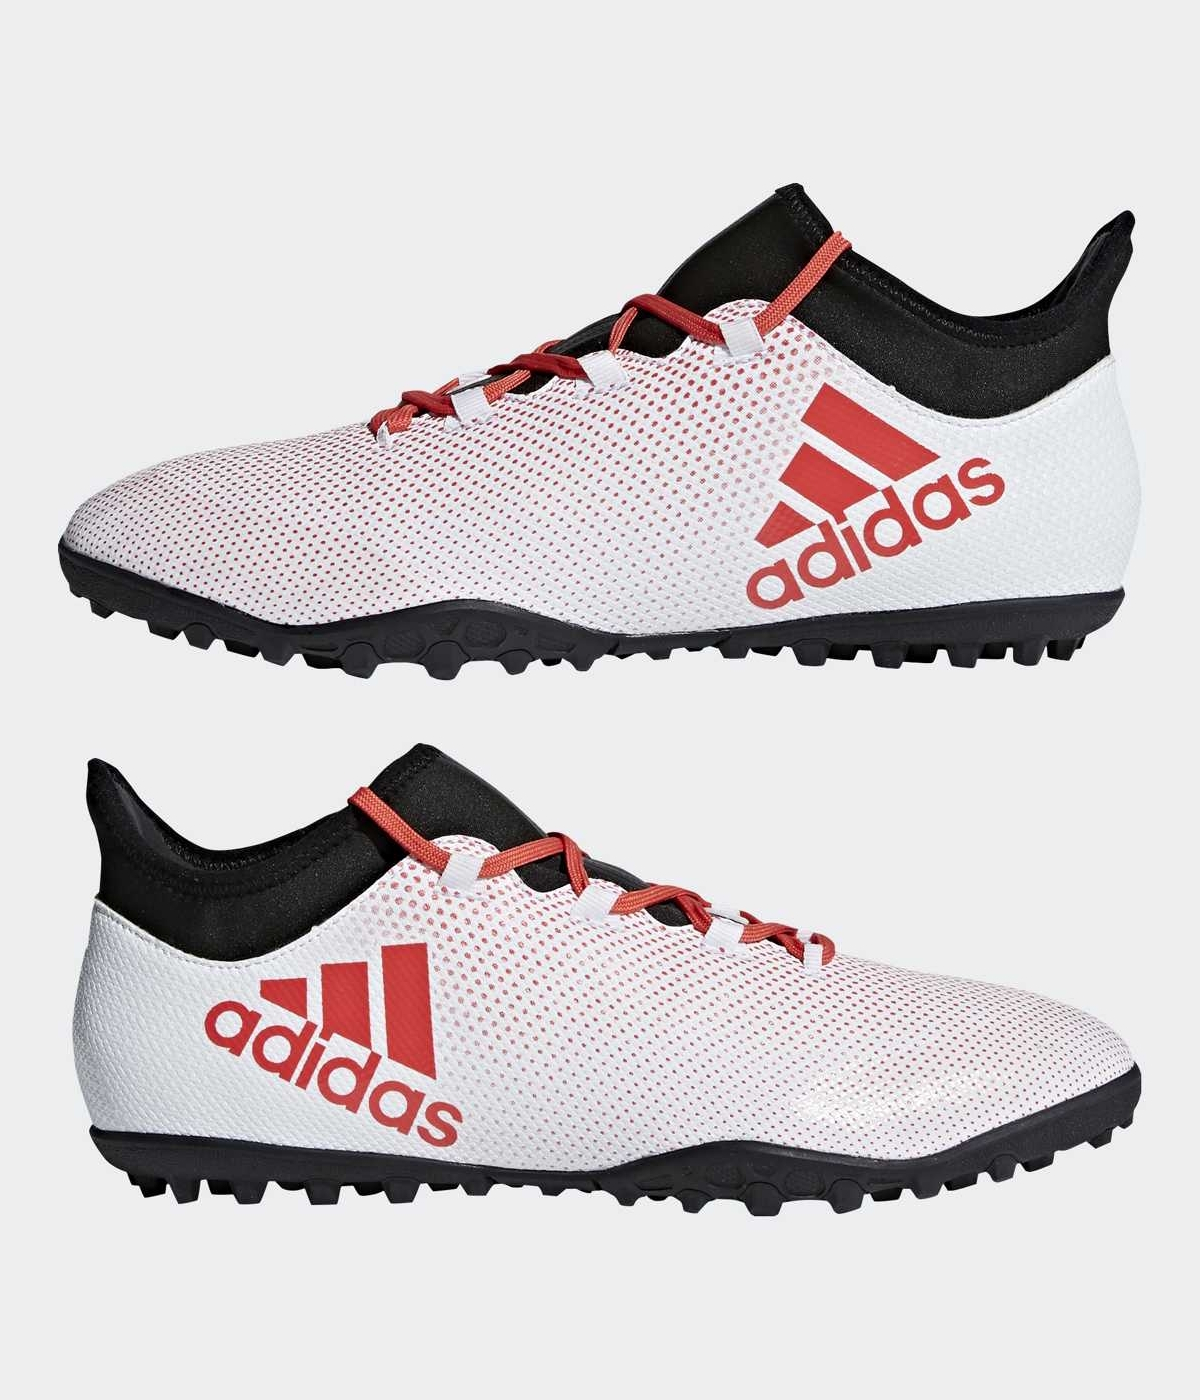 38cb4dd8ce9af5 Football shoes Adidas football shoes X Tango 17.3 Grey Five-a-side ...